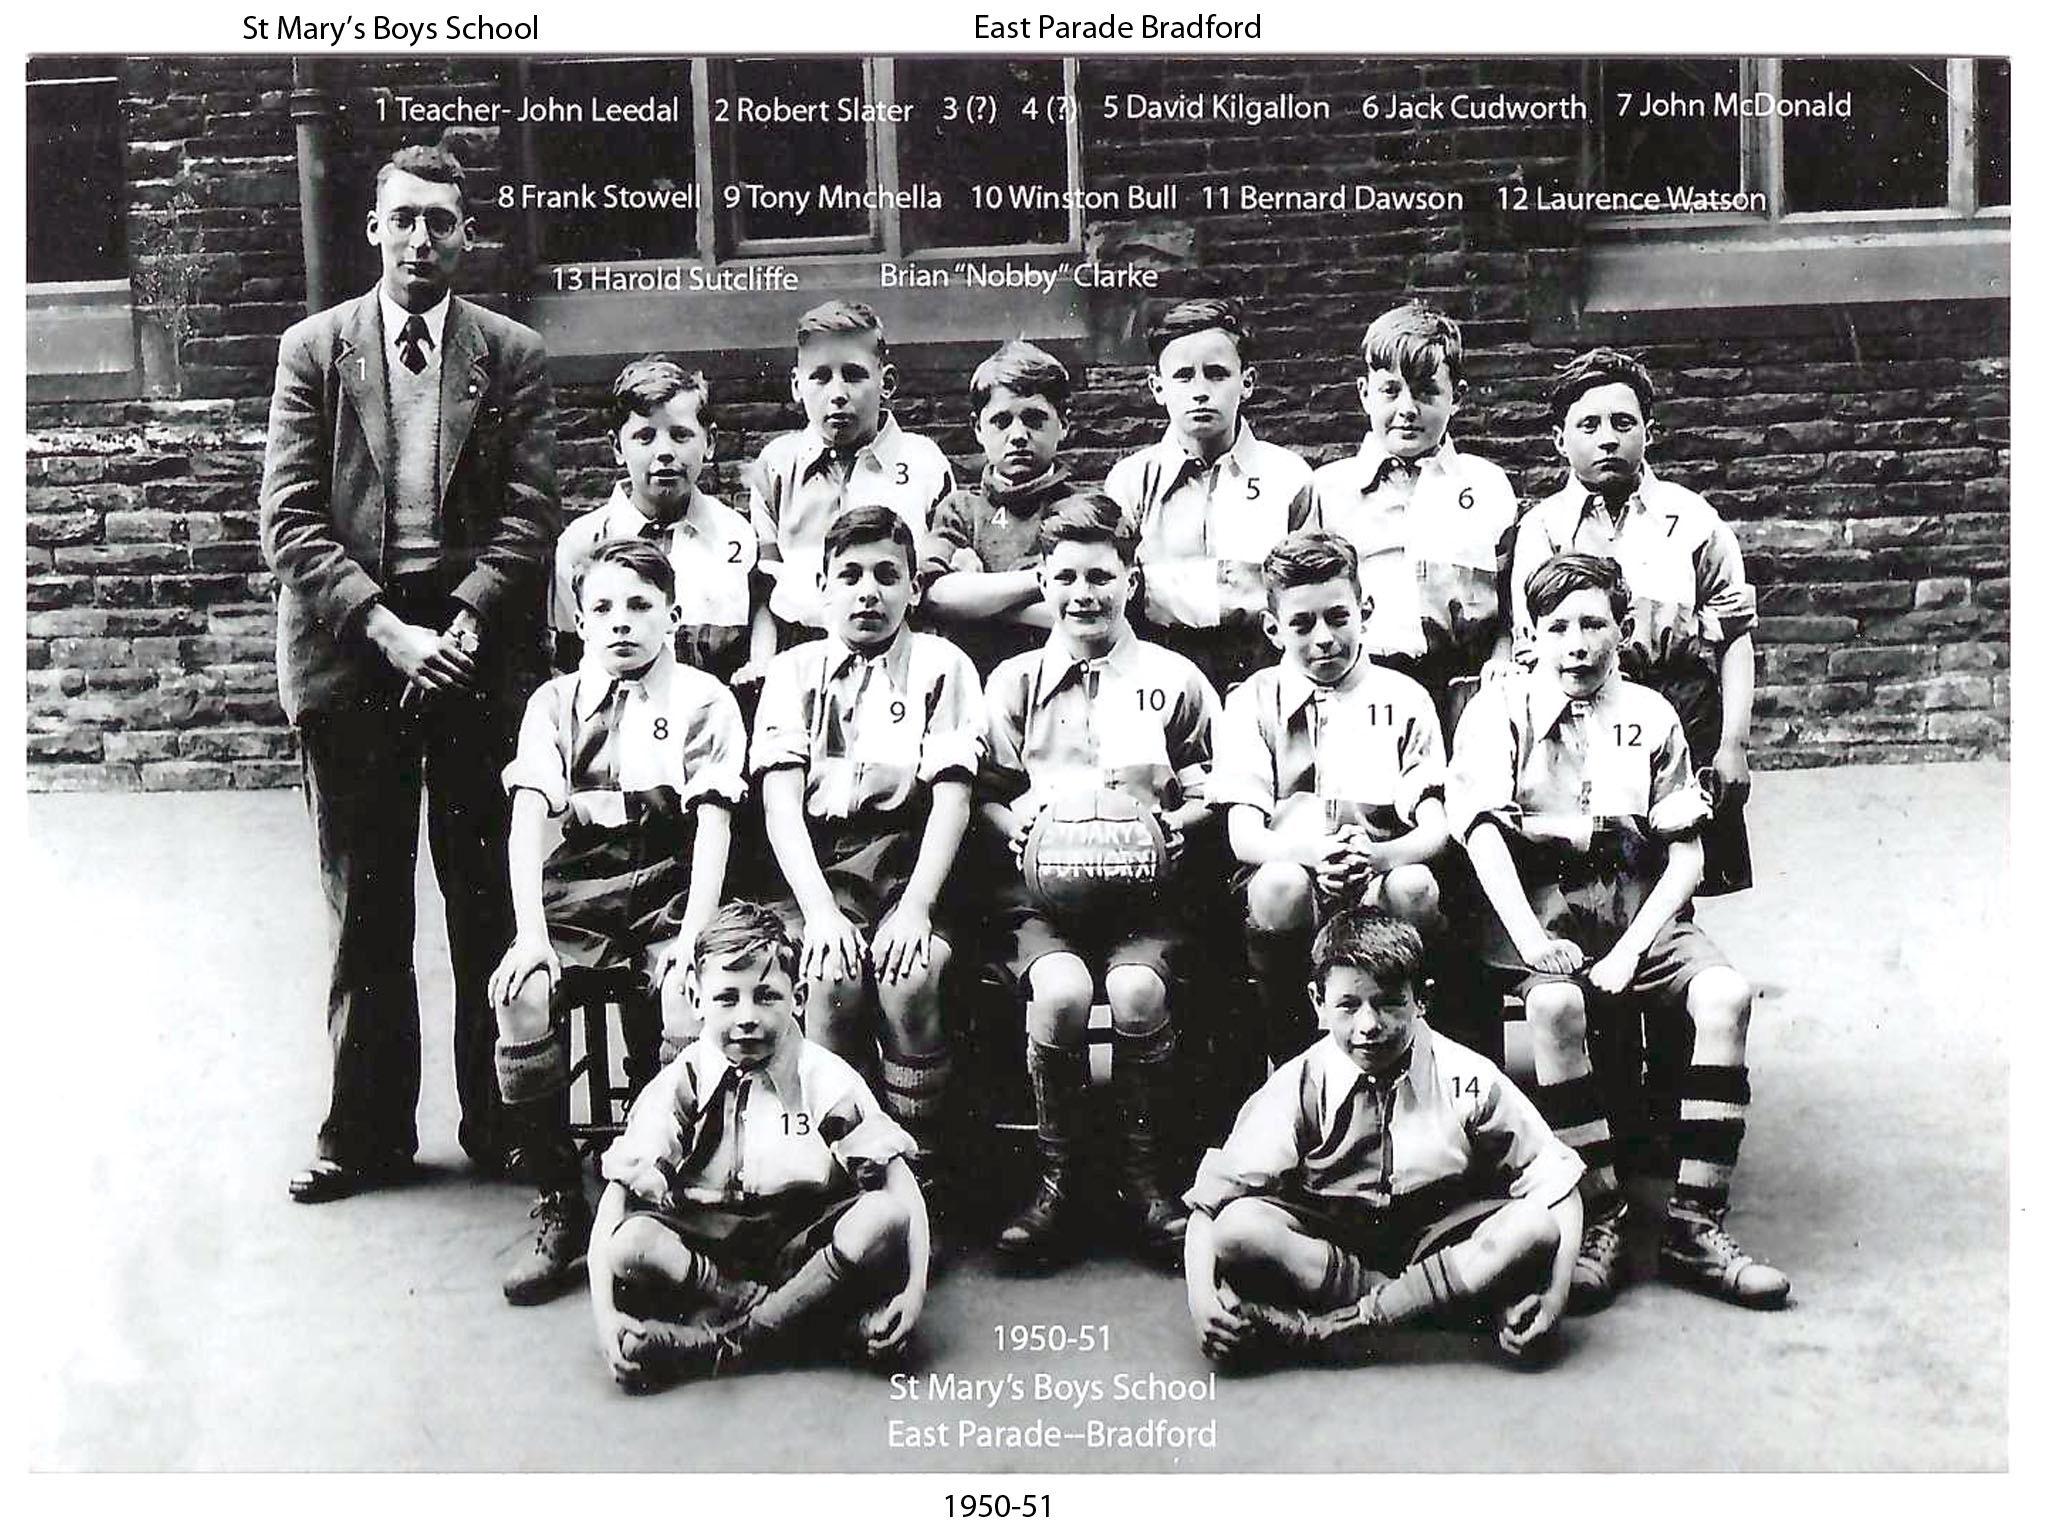 NOSTALGIA: Bradford childhood memories